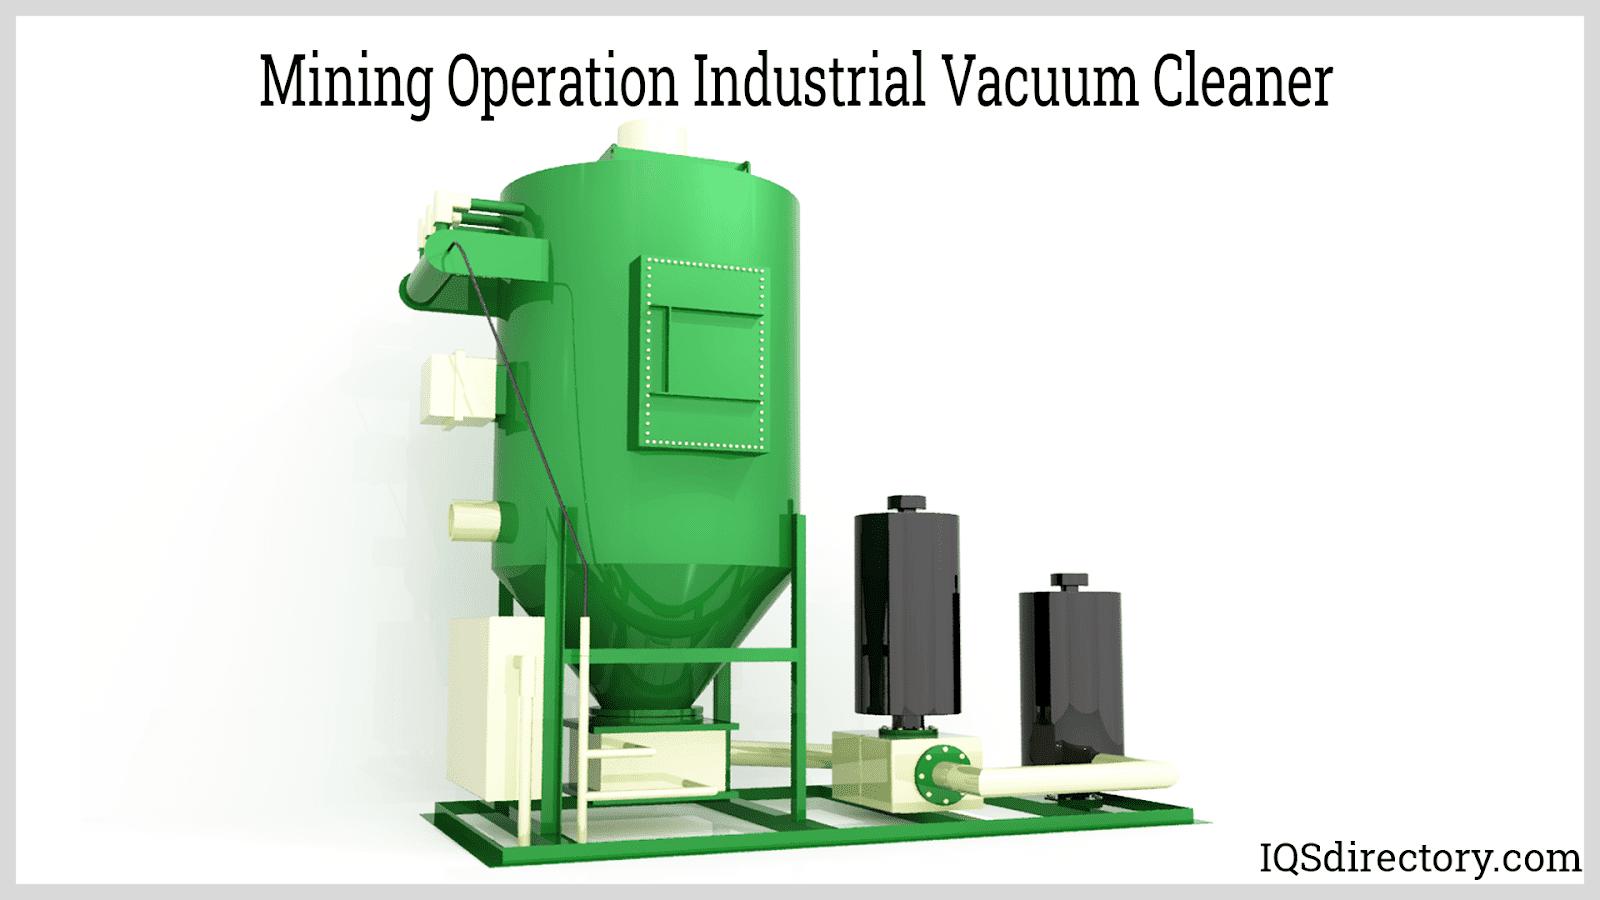 Mining Operation Industrial Vacuum Cleaner